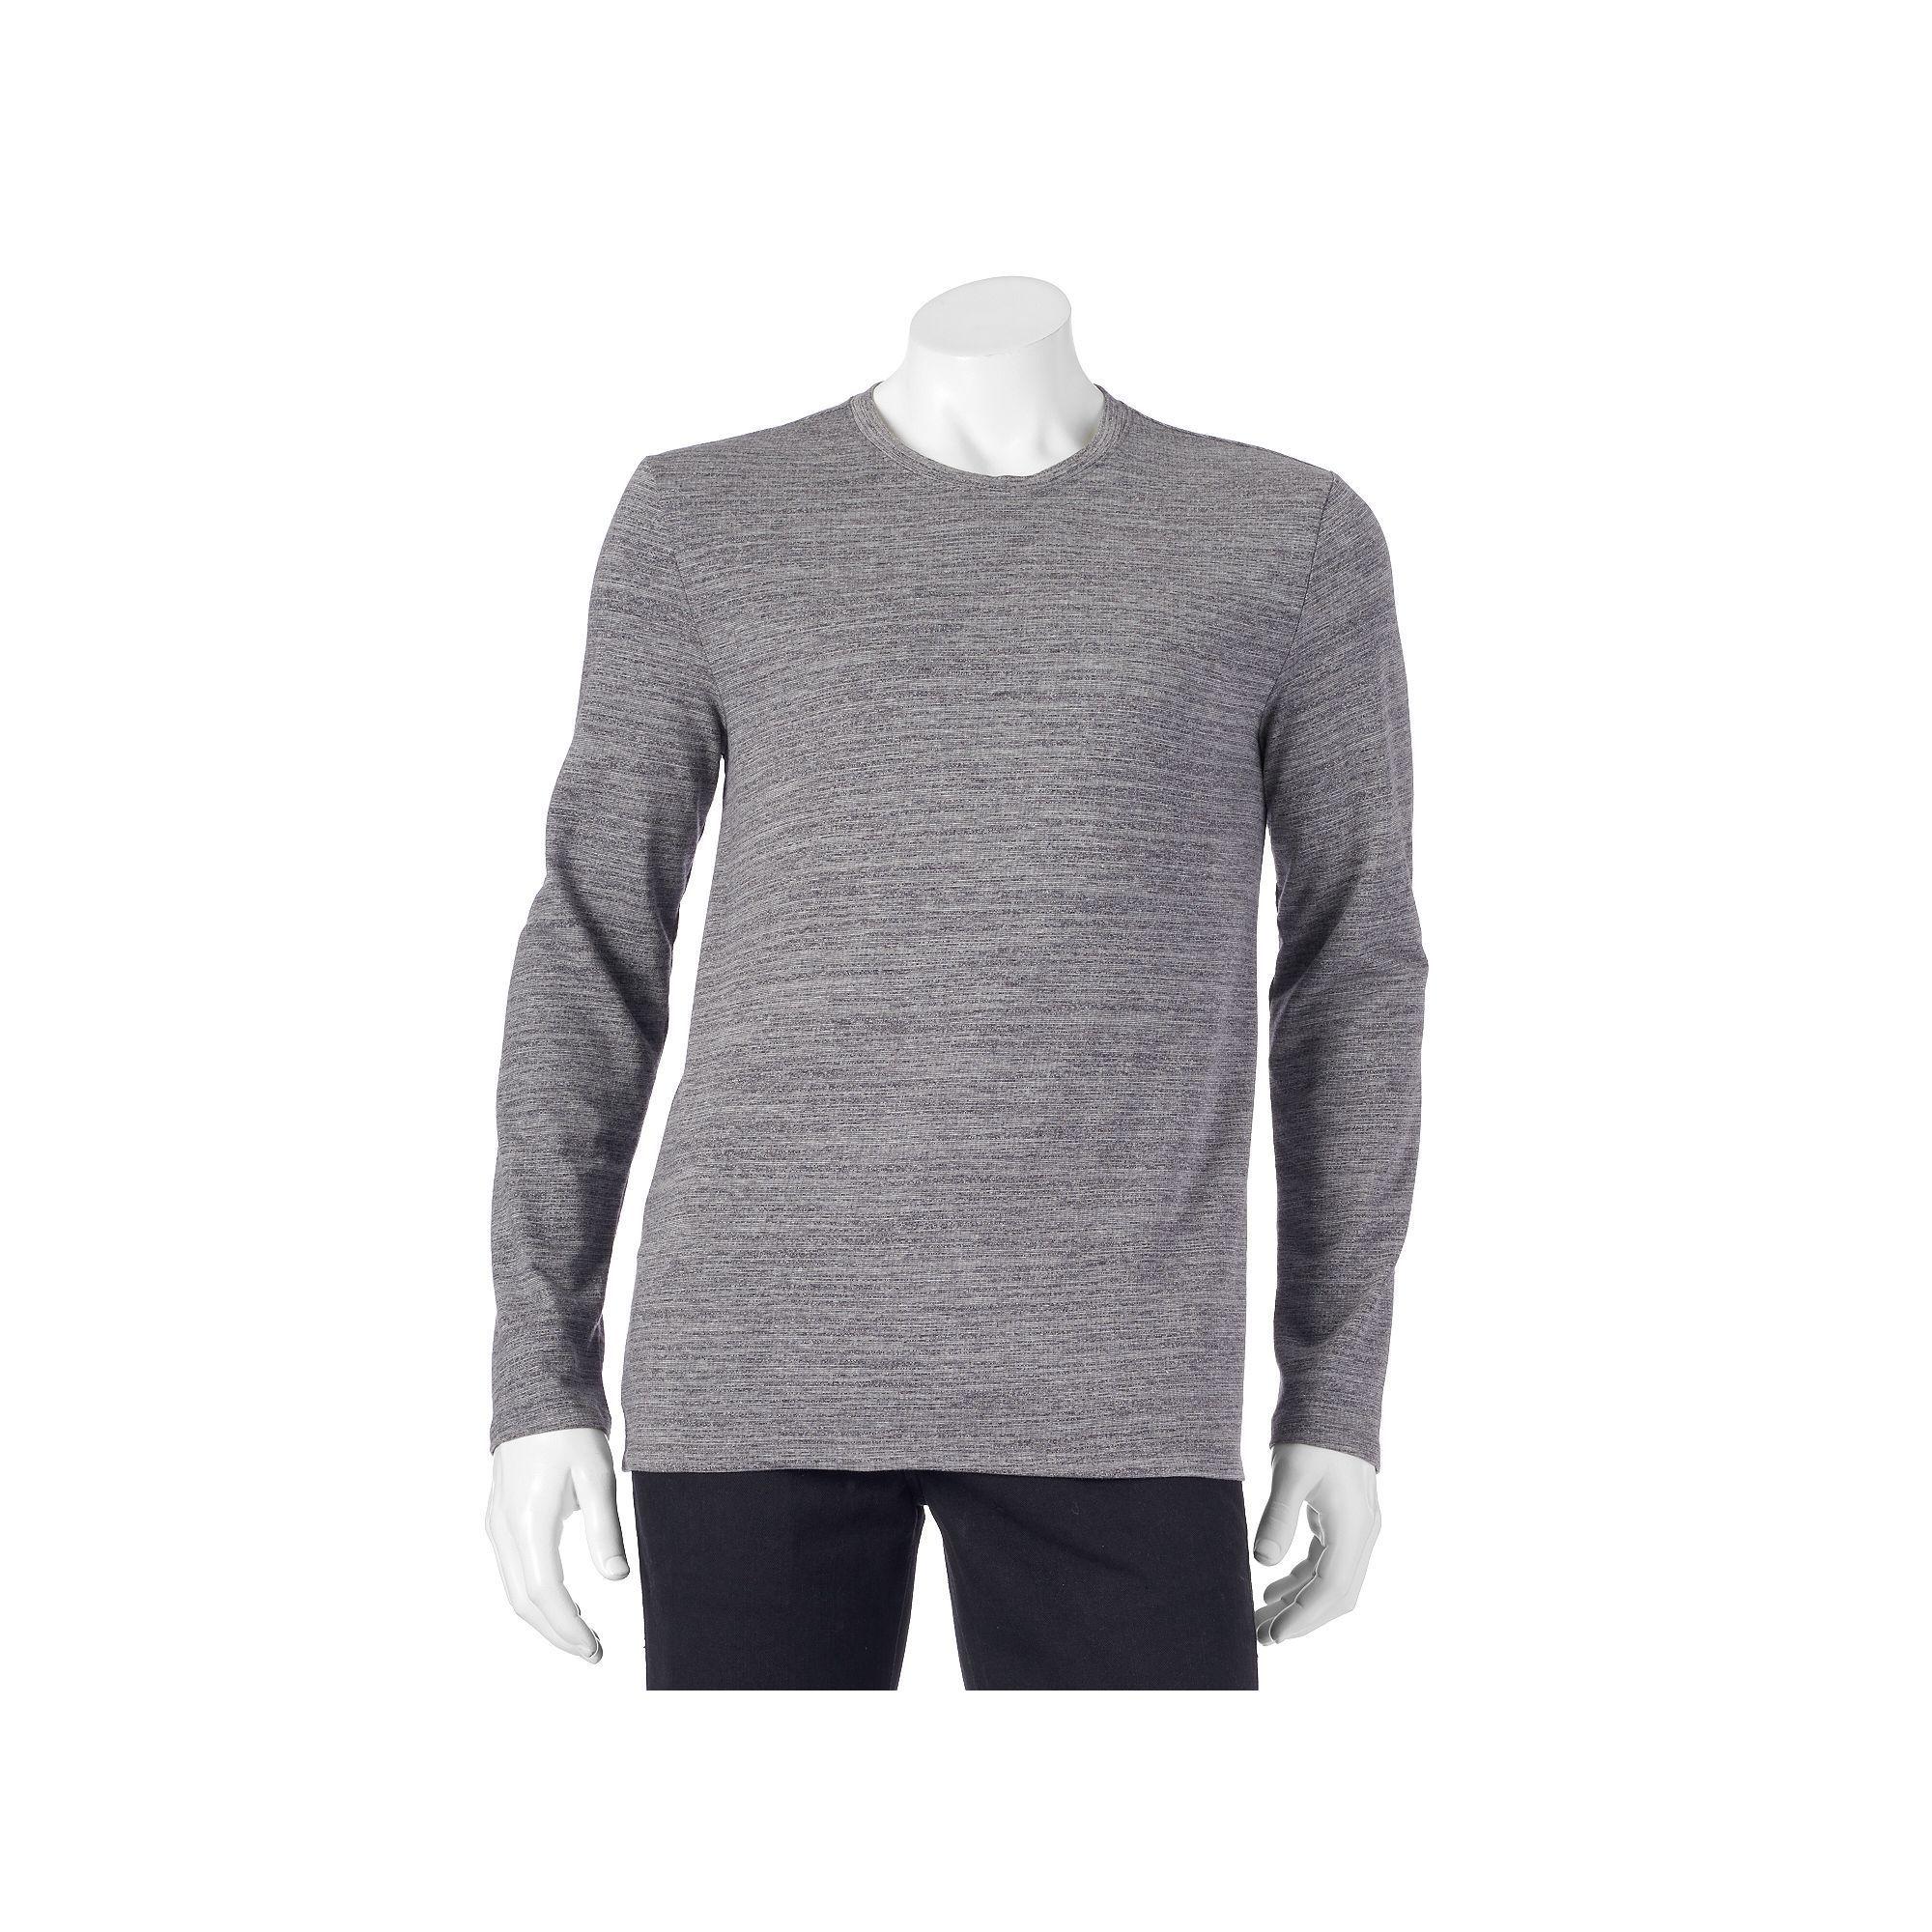 Black and white striped t shirt xxl - Men S Apt 9 Jaspe Modern Fit Interloop Texture Striped Tee Size Xxl Drk Purple